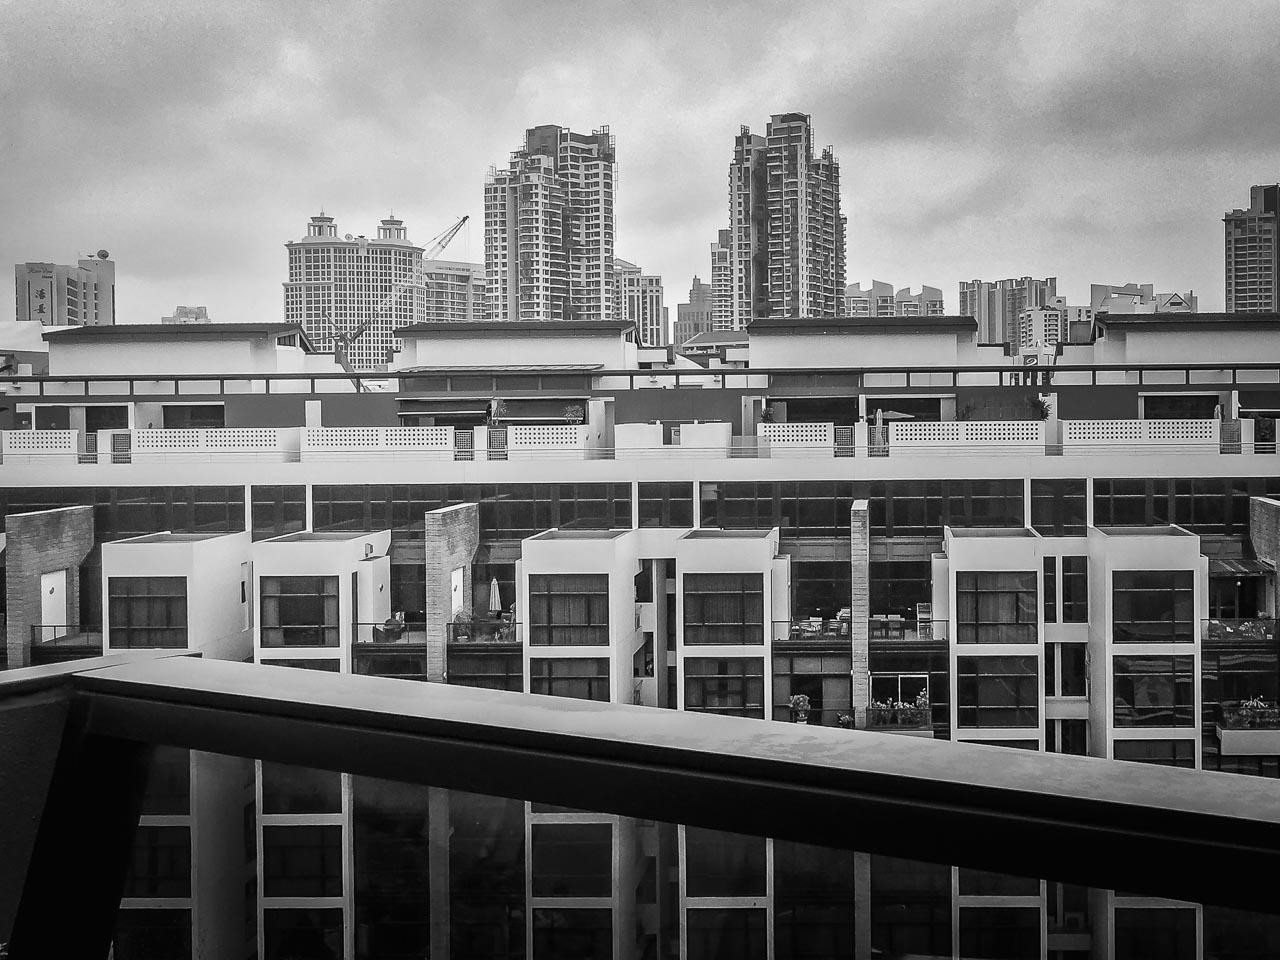 150812-singapore-125858-Edit-instagram.jpg